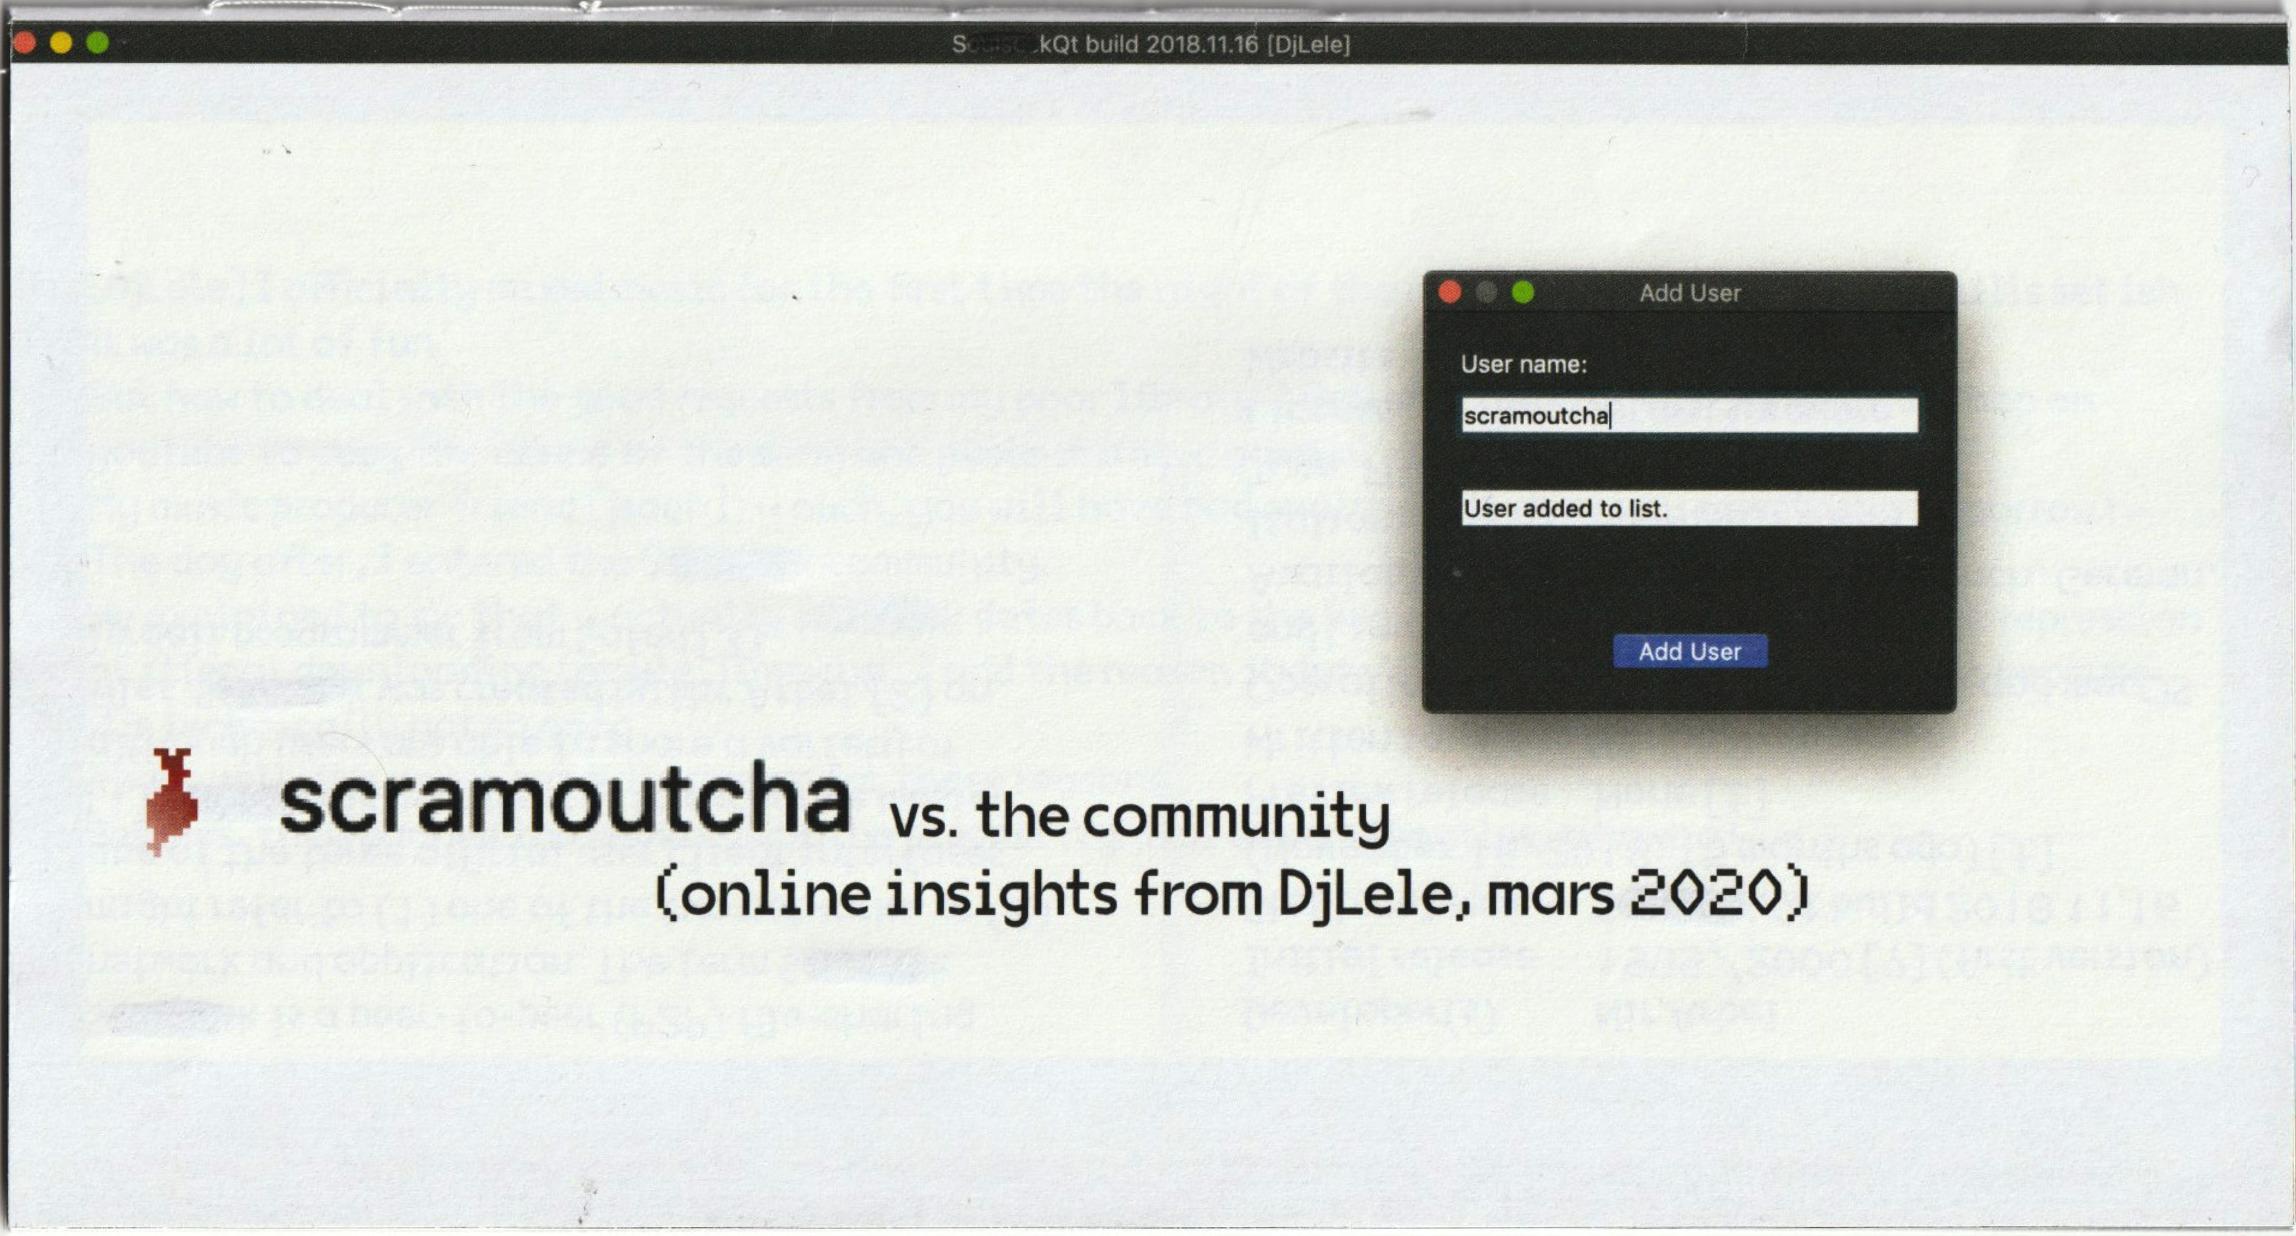 Scramoutcha vs the Community